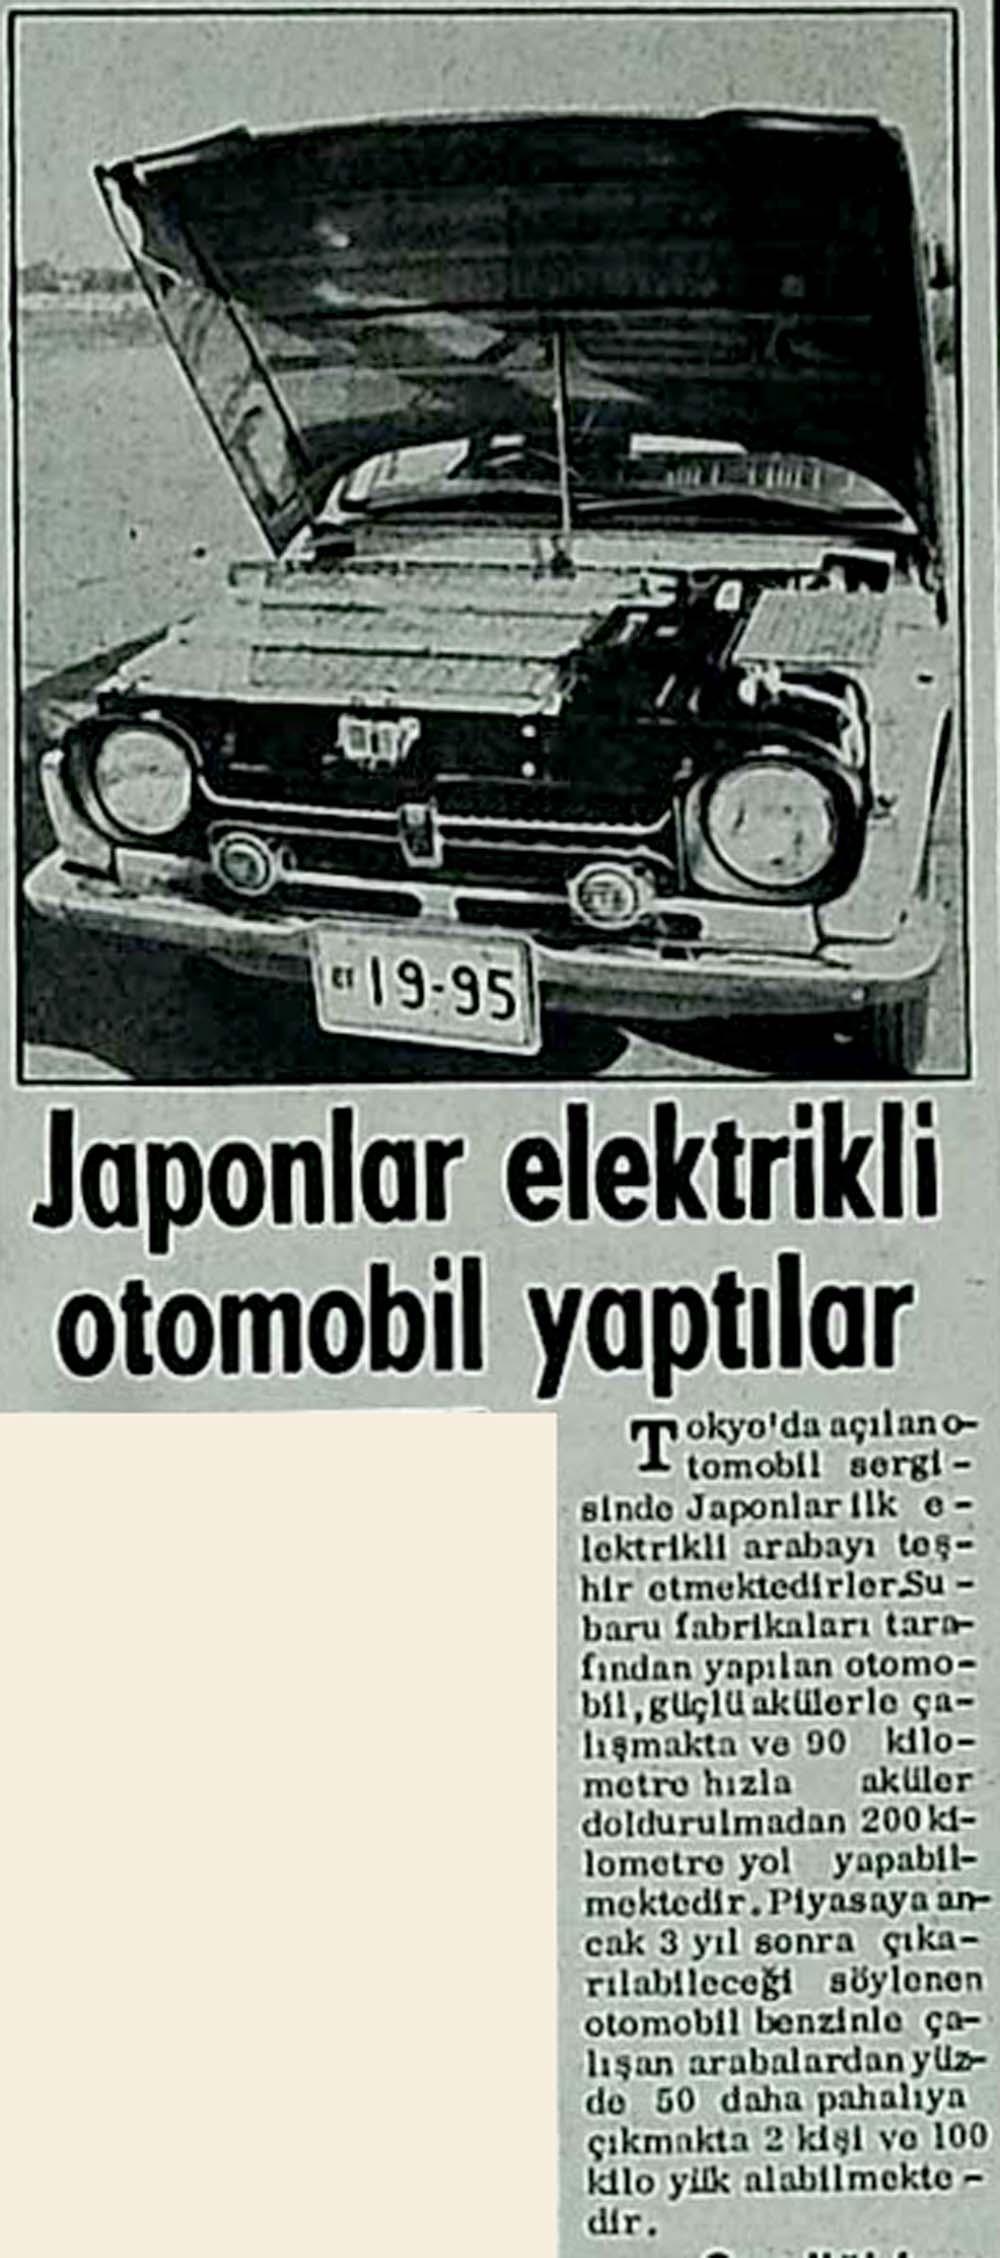 Japonlar elektrikli otomobil yaptılar